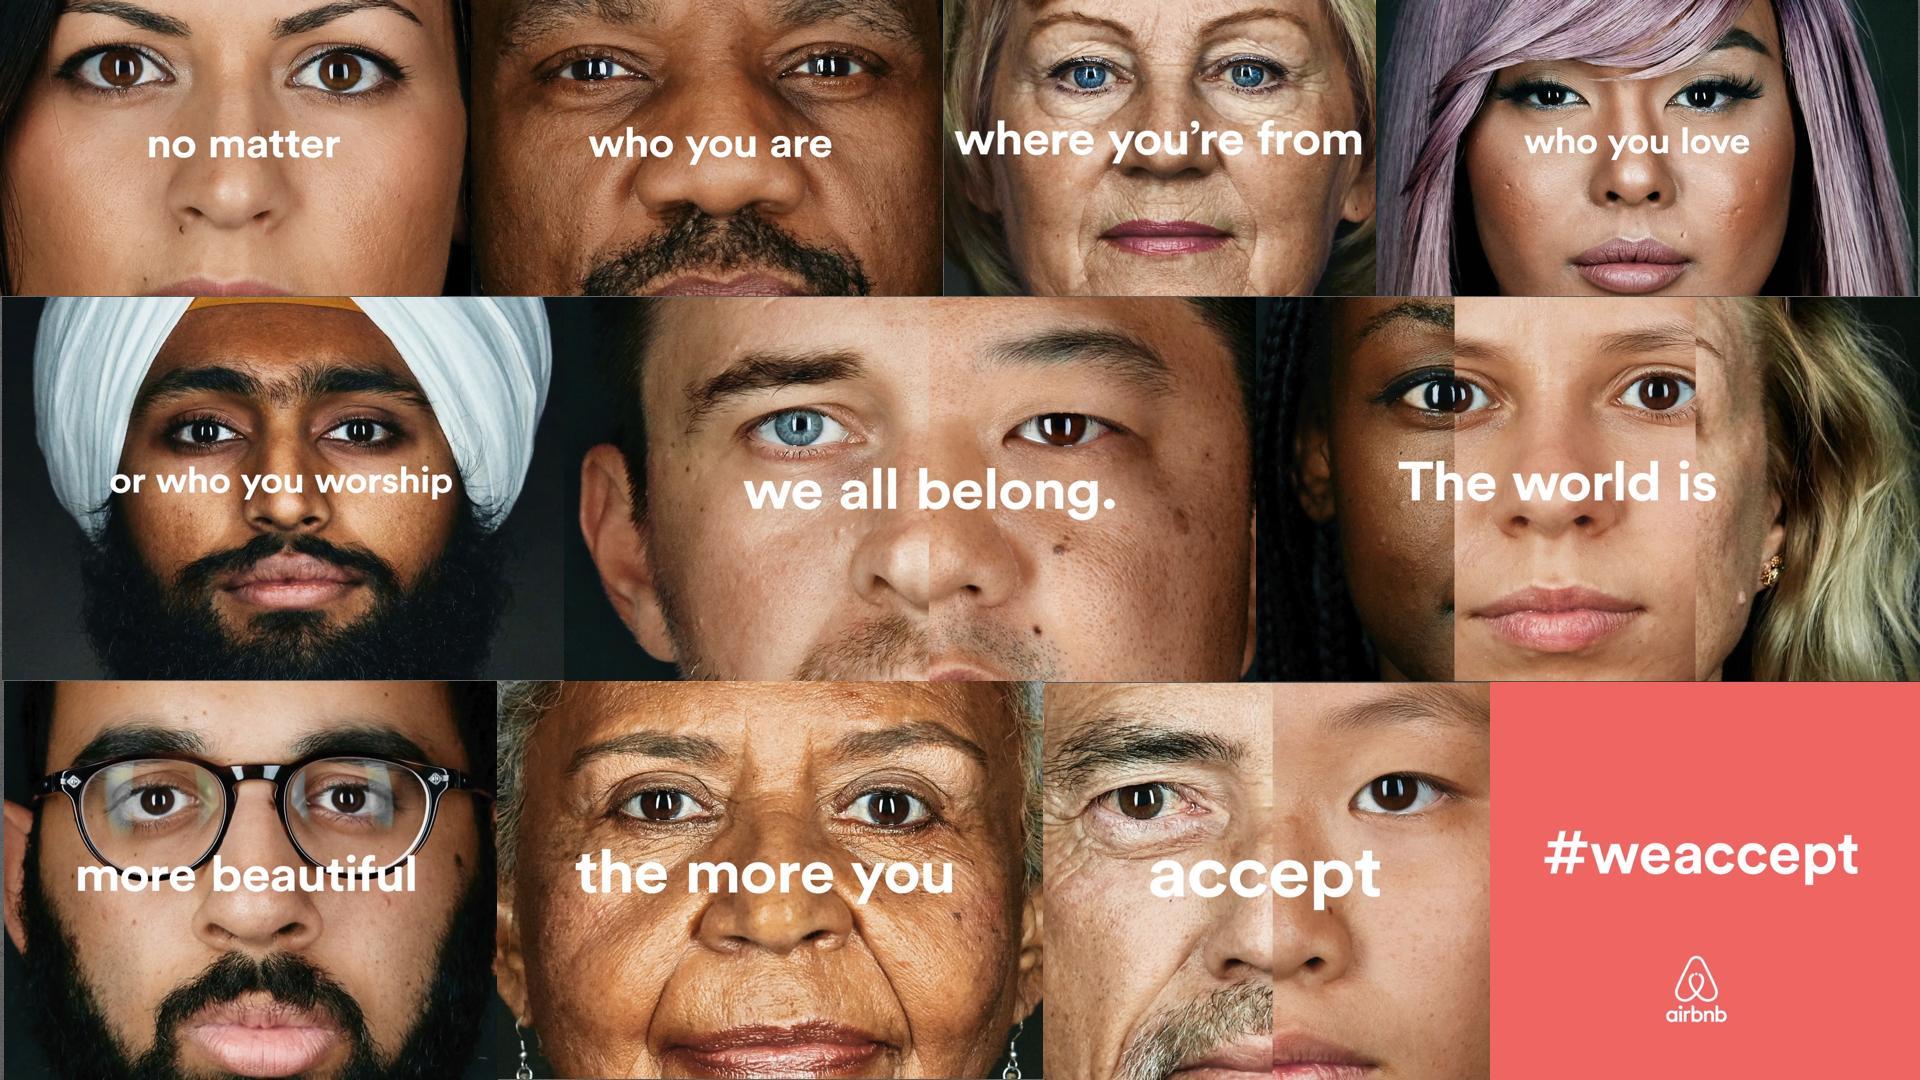 Airbnb #WeAccept campaign